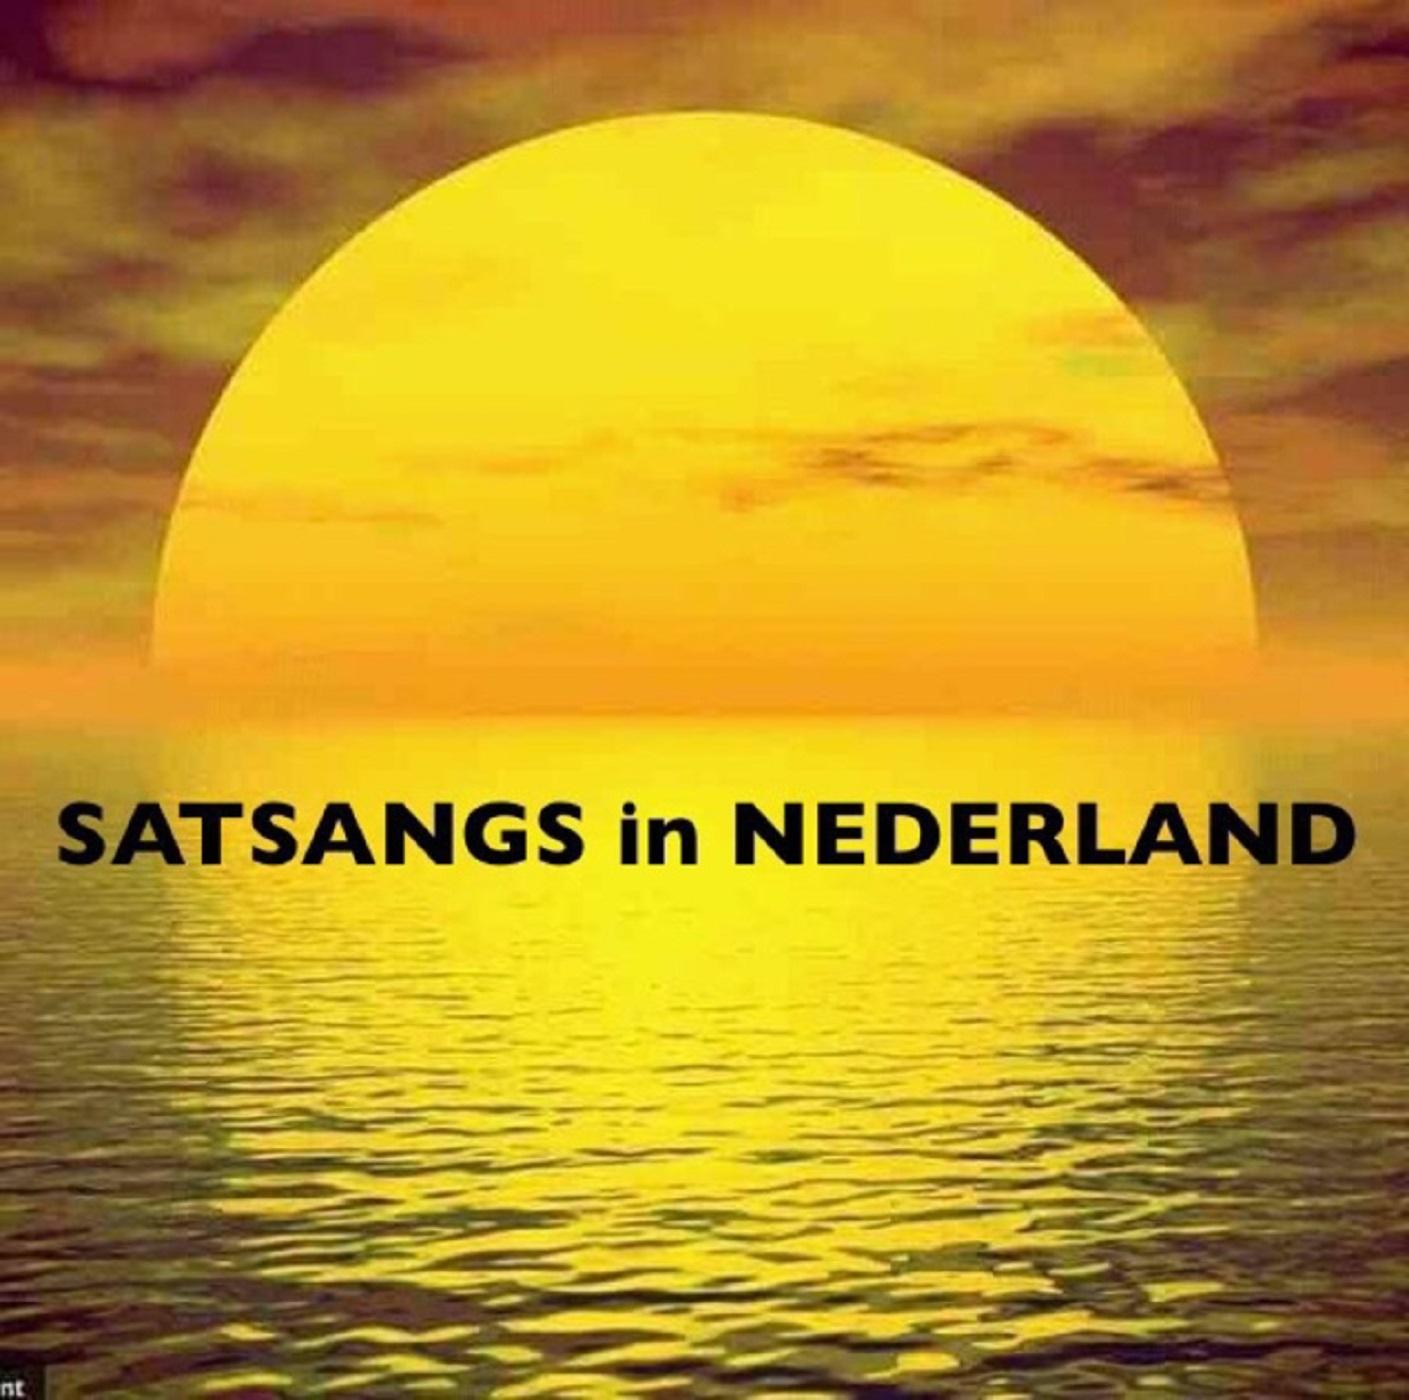 Satsangs in Nederland